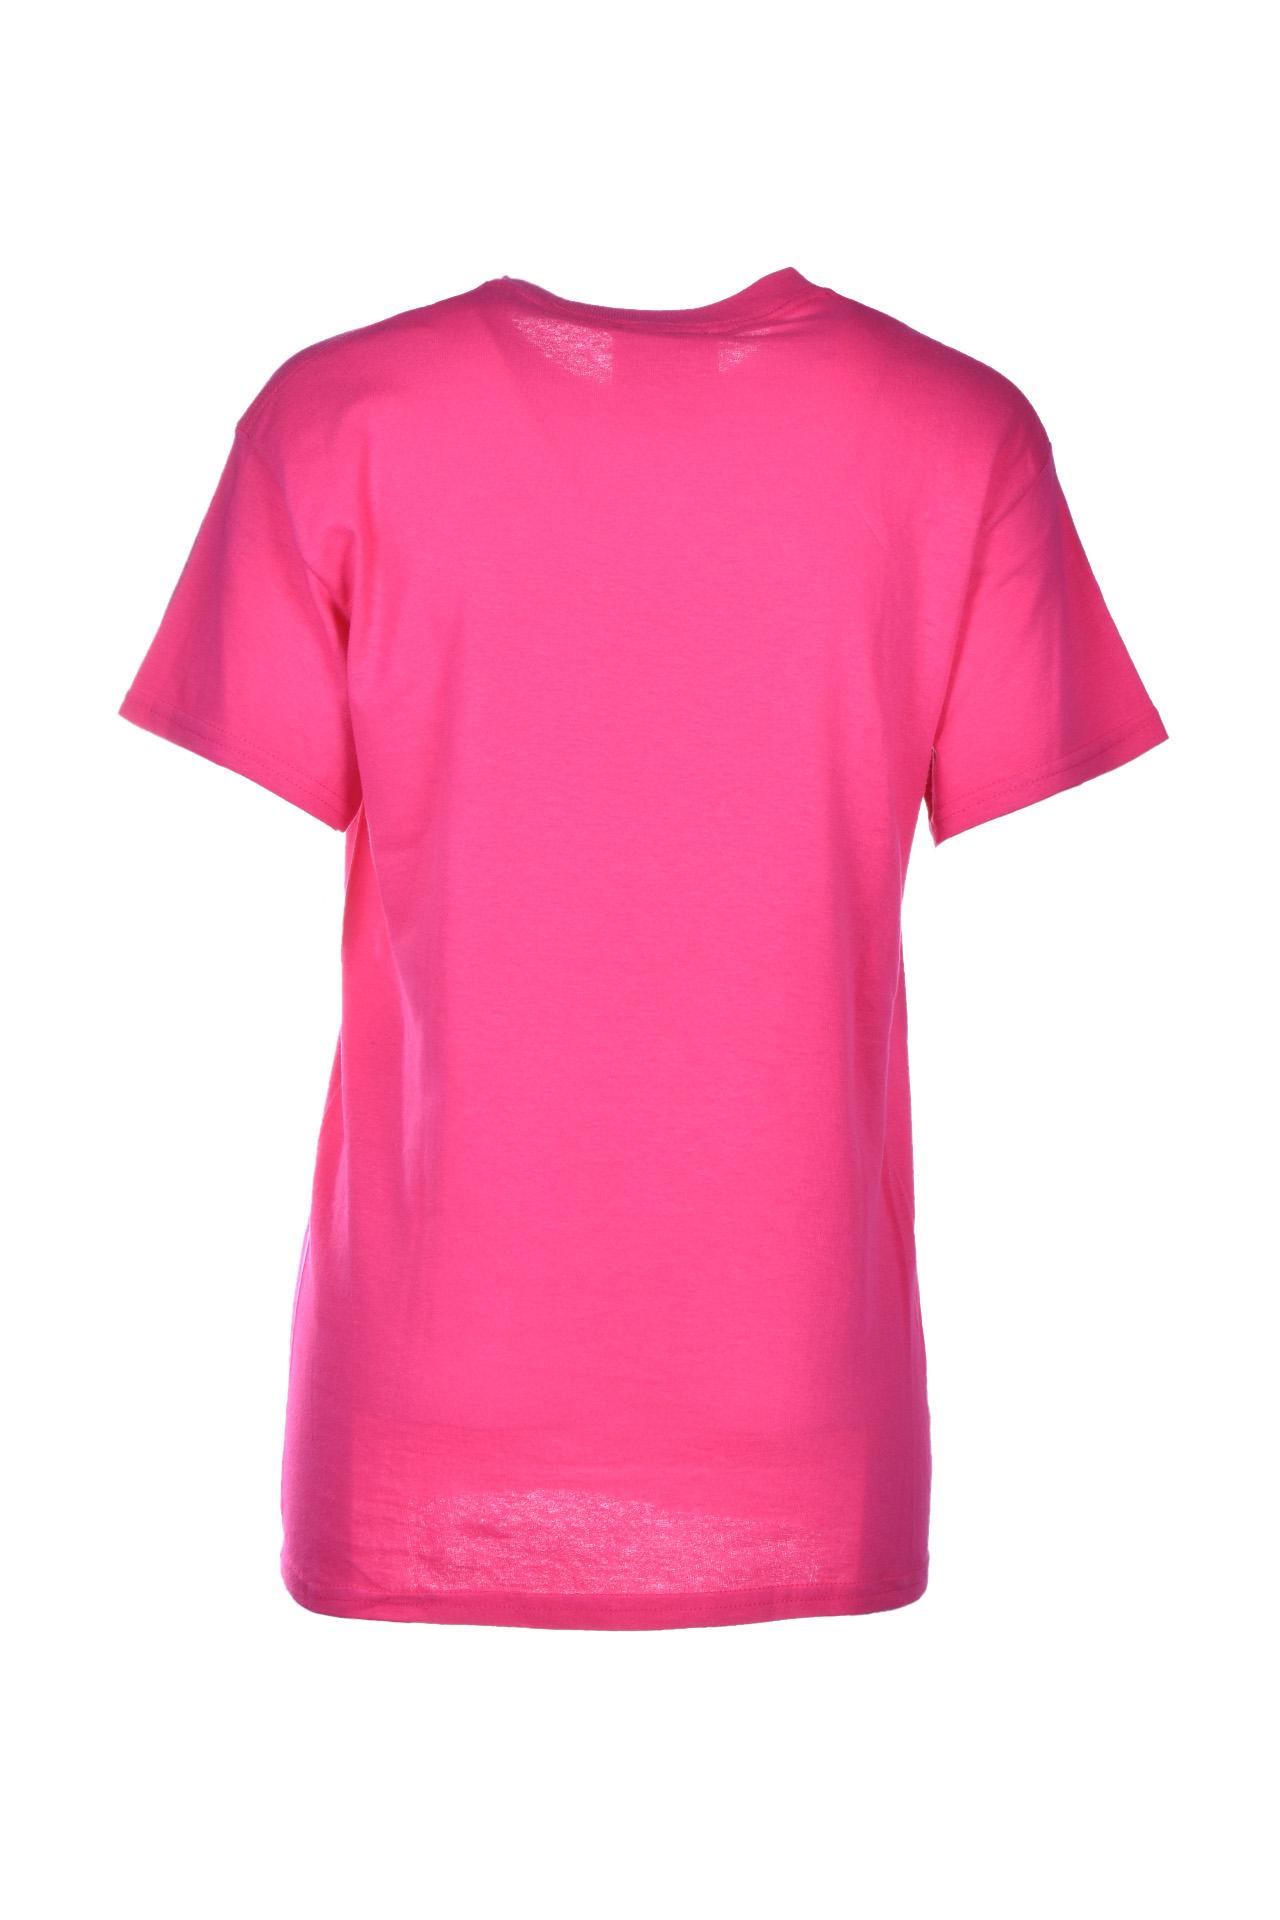 laurentin fuchsia t-shirt with logo SEMICOUTURE | T-shirts | Y0SJ44G47-0